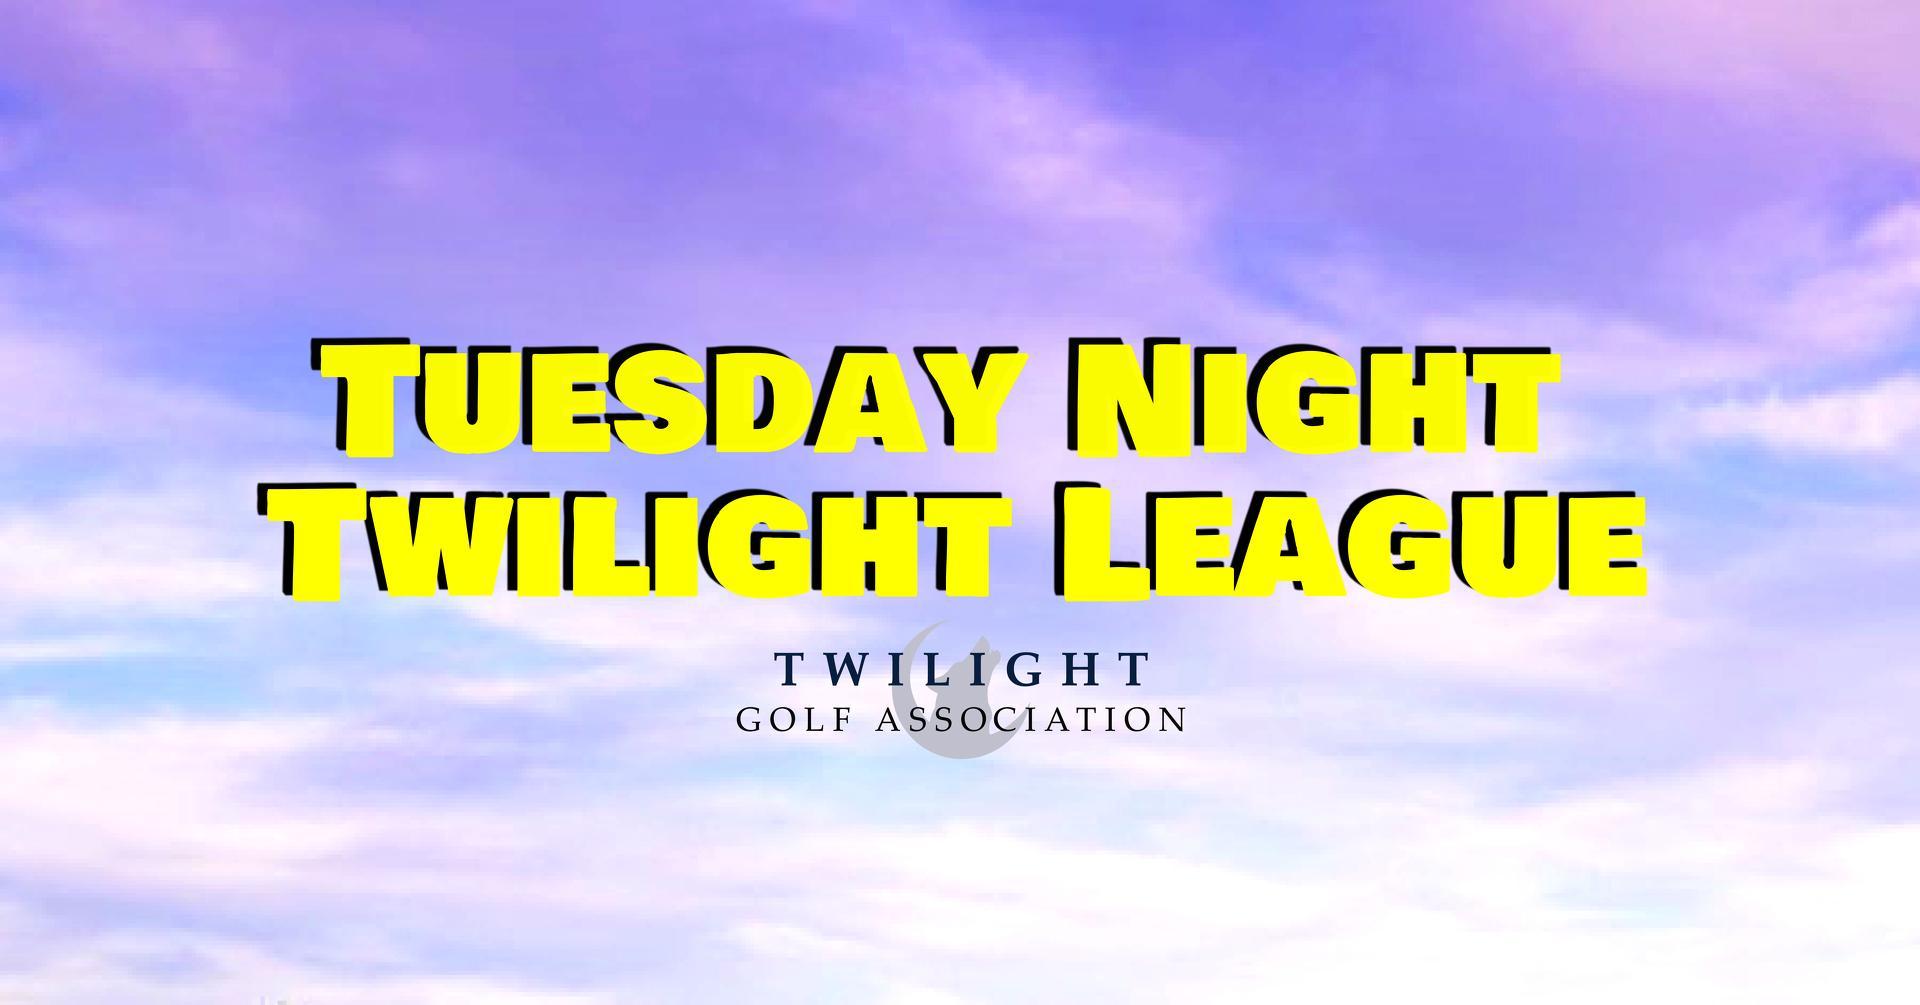 Tuesday Twilight League at DeBell Golf Club